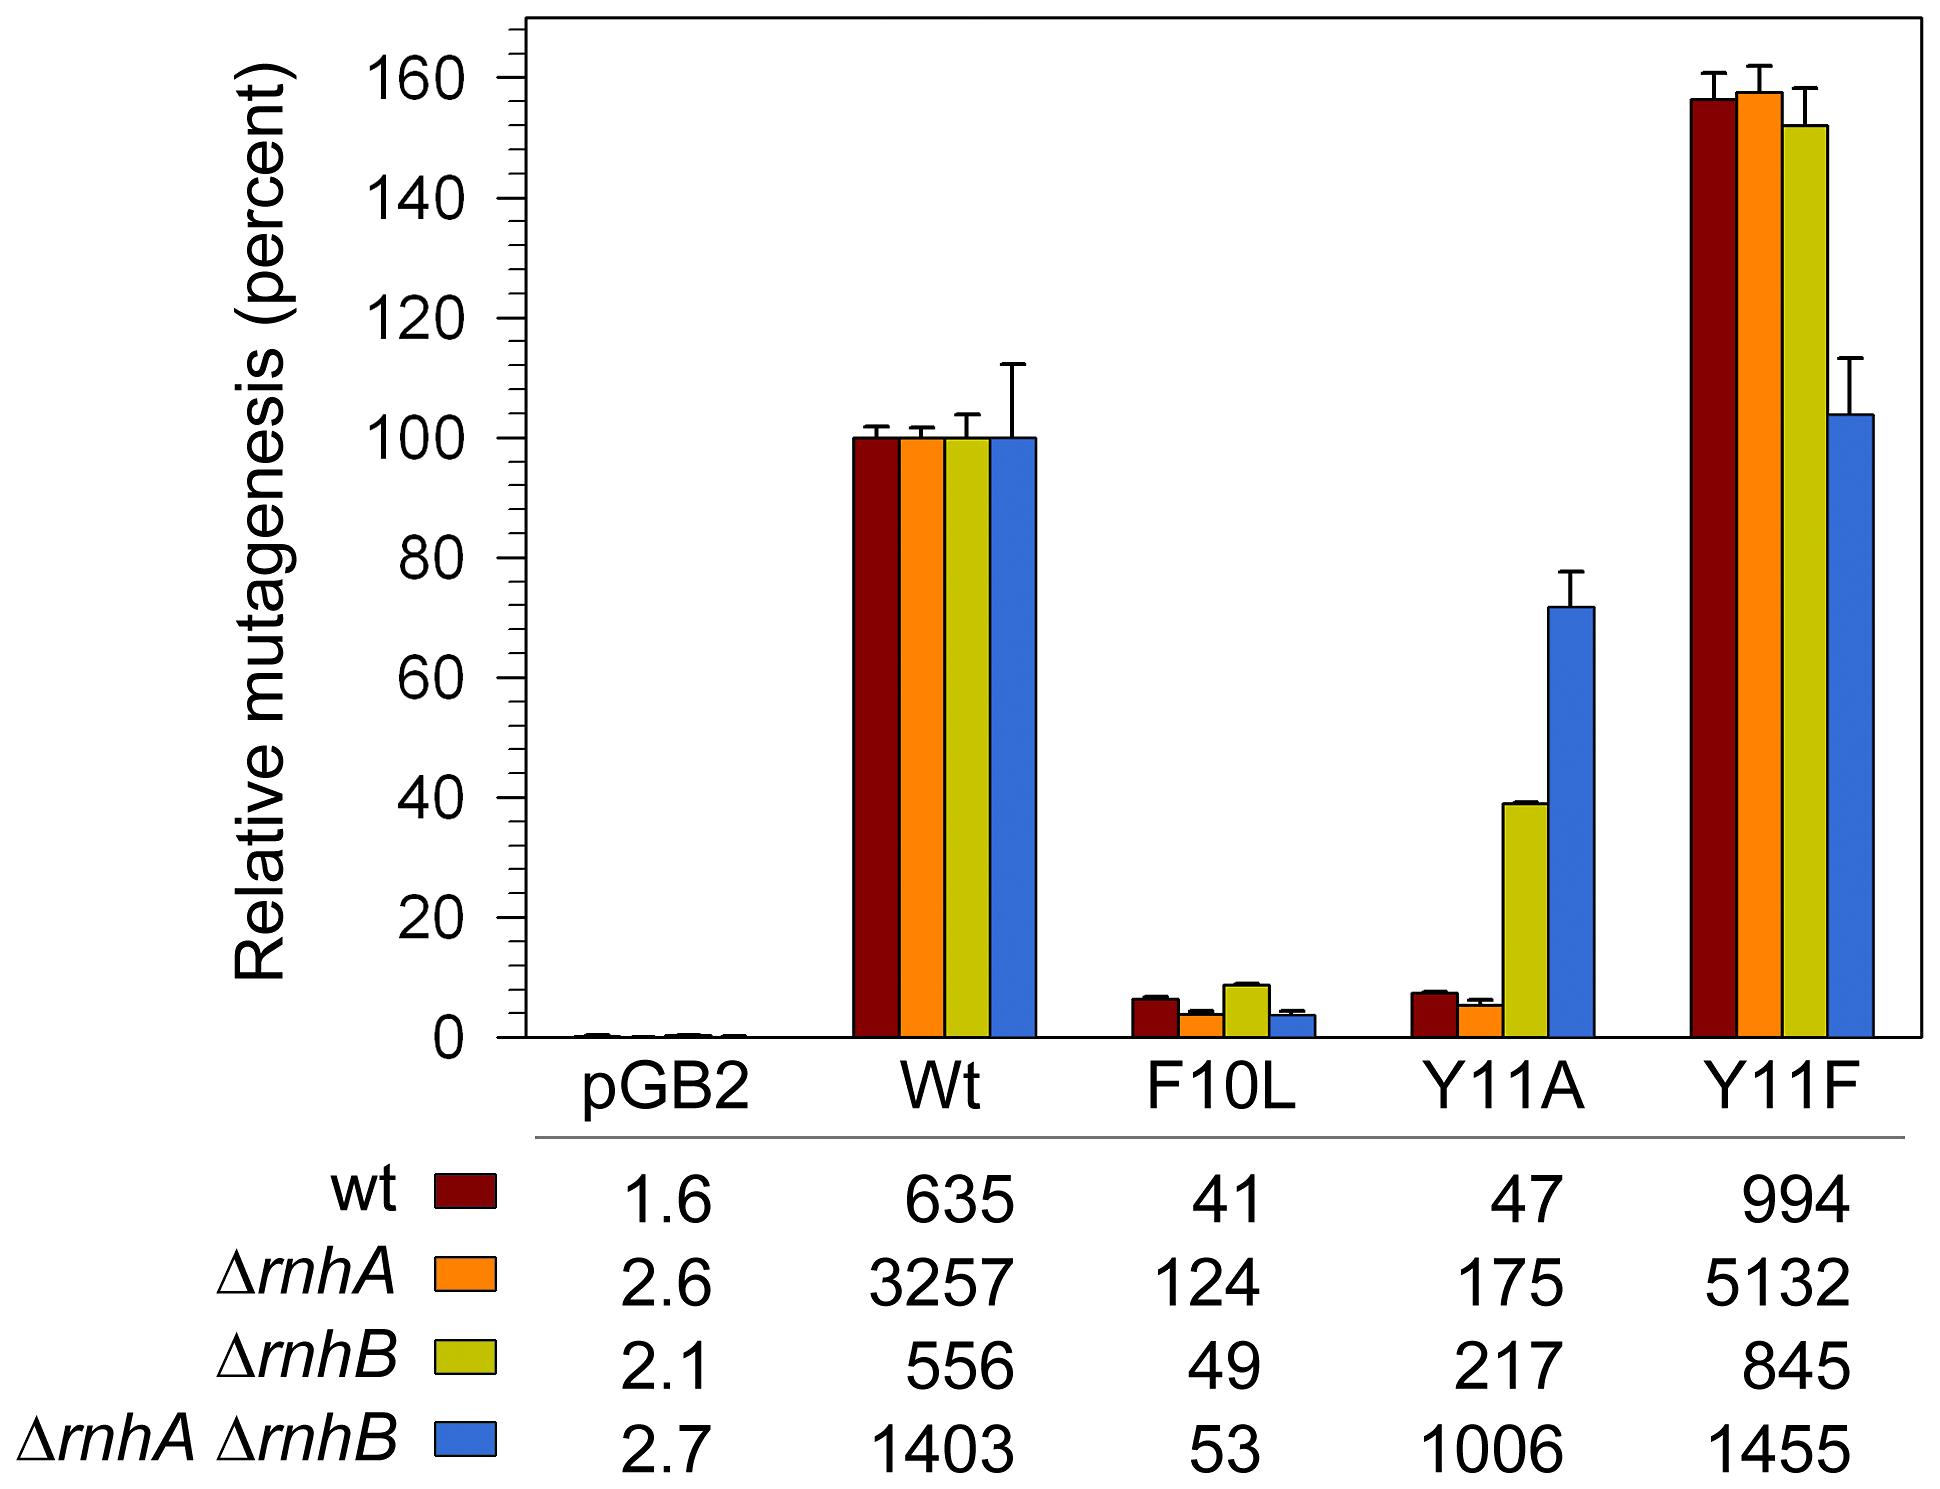 Effect of Δ<i>rnhA</i> and Δ<i>rnhB</i> on spontaneous mutagenesis in <i>recA730 lexA</i>(Def) Δ<i>umuDC</i> Δ<i>dinB</i> strains expressing pol V variants.